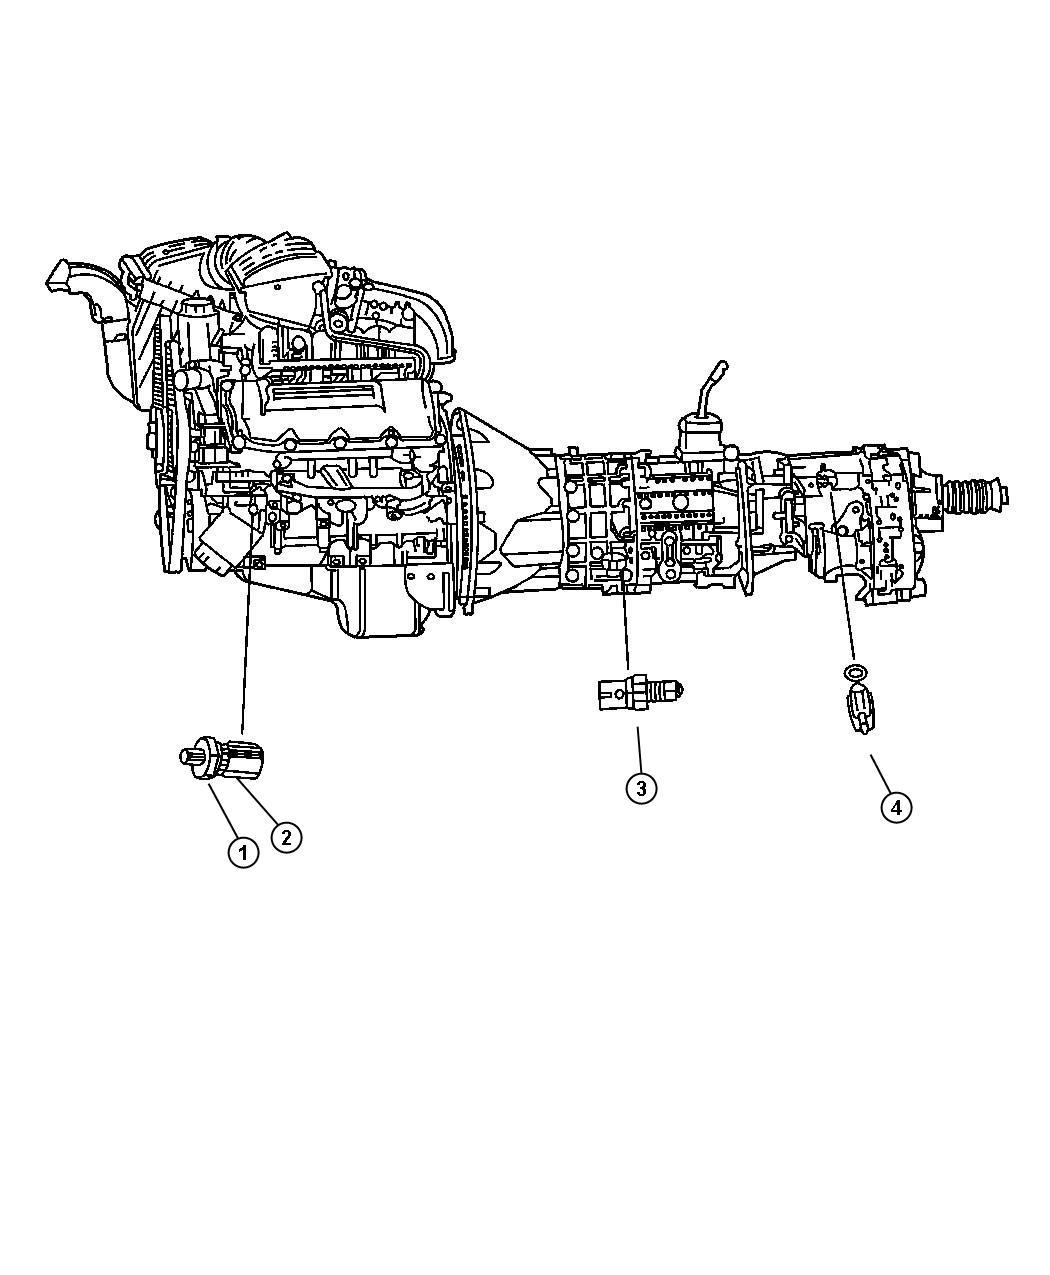 Dodge Ram Slt Quad Cab 5 7l Hemi V8 A T 4x4